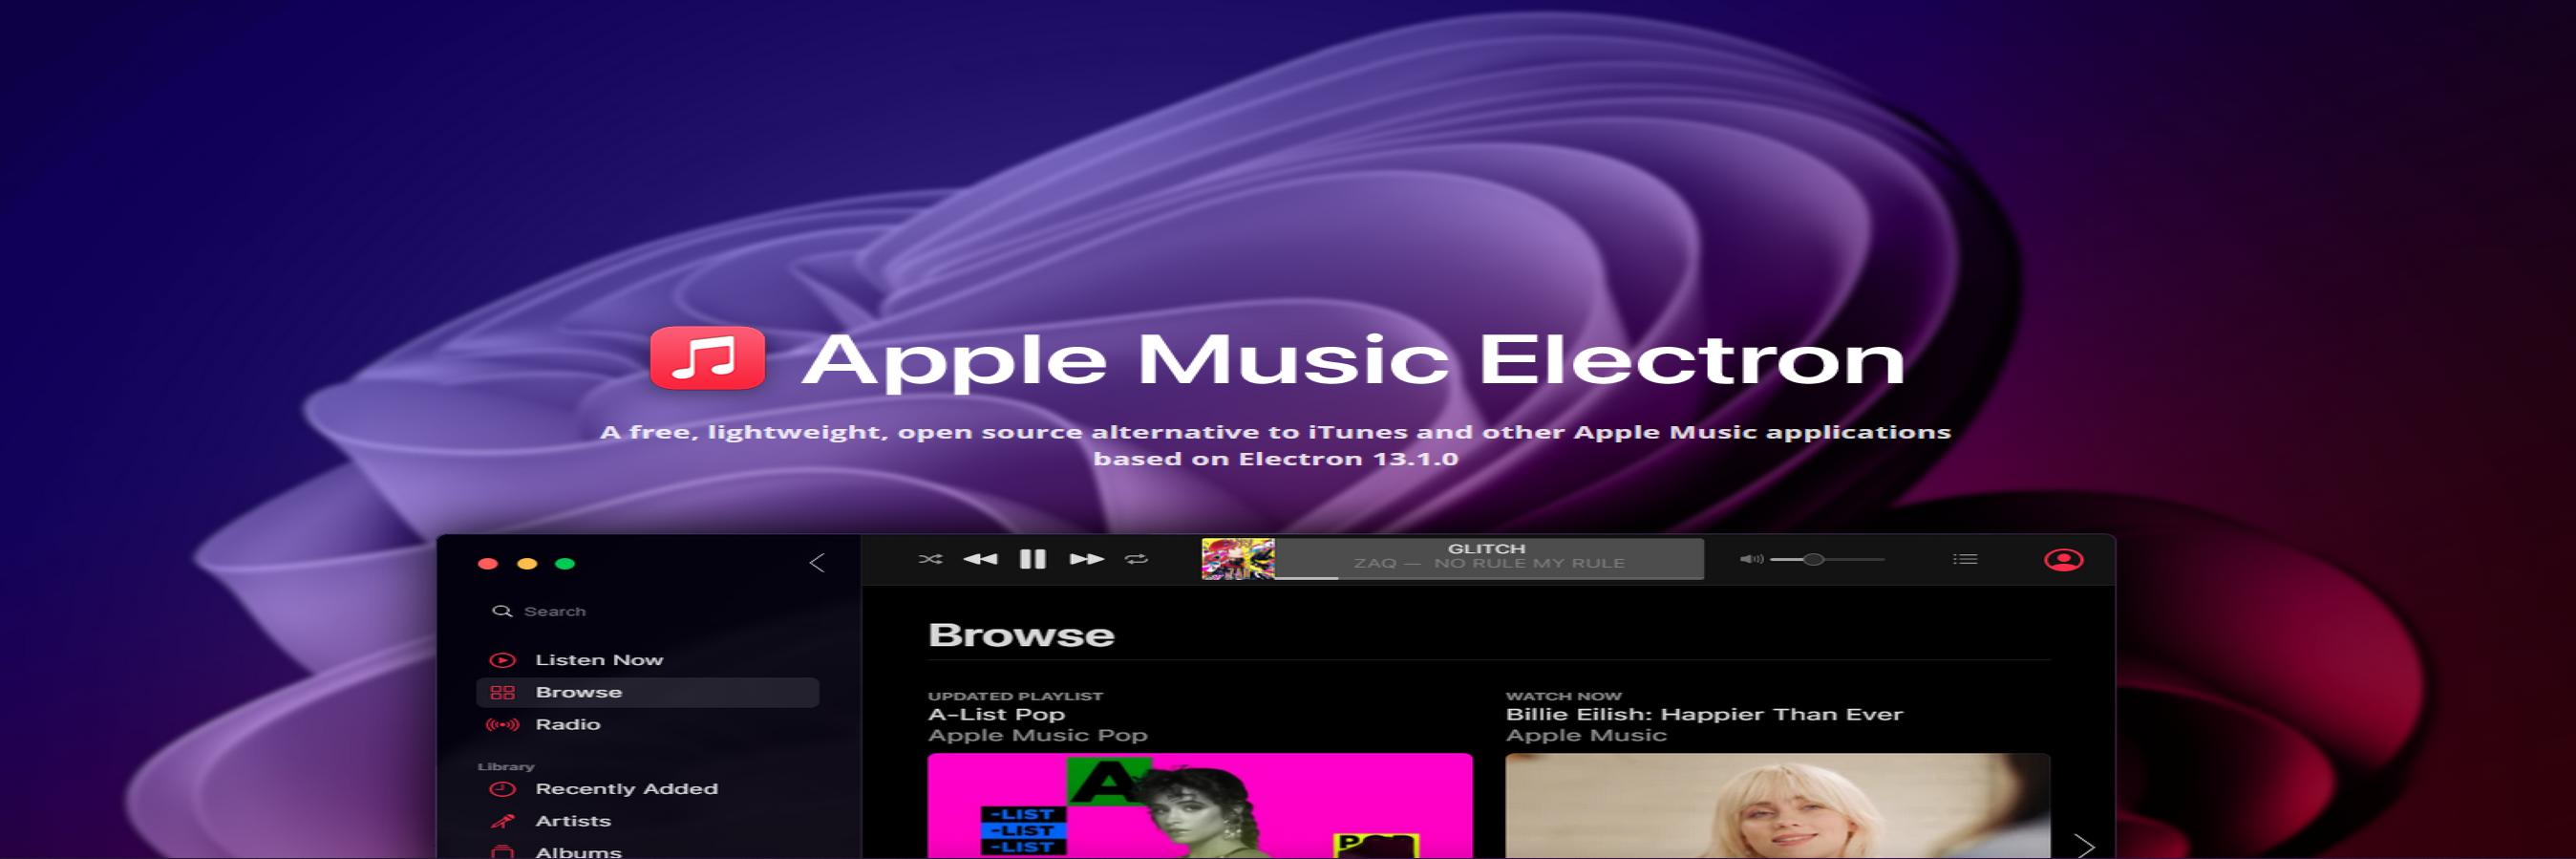 Apple Music Electron banner